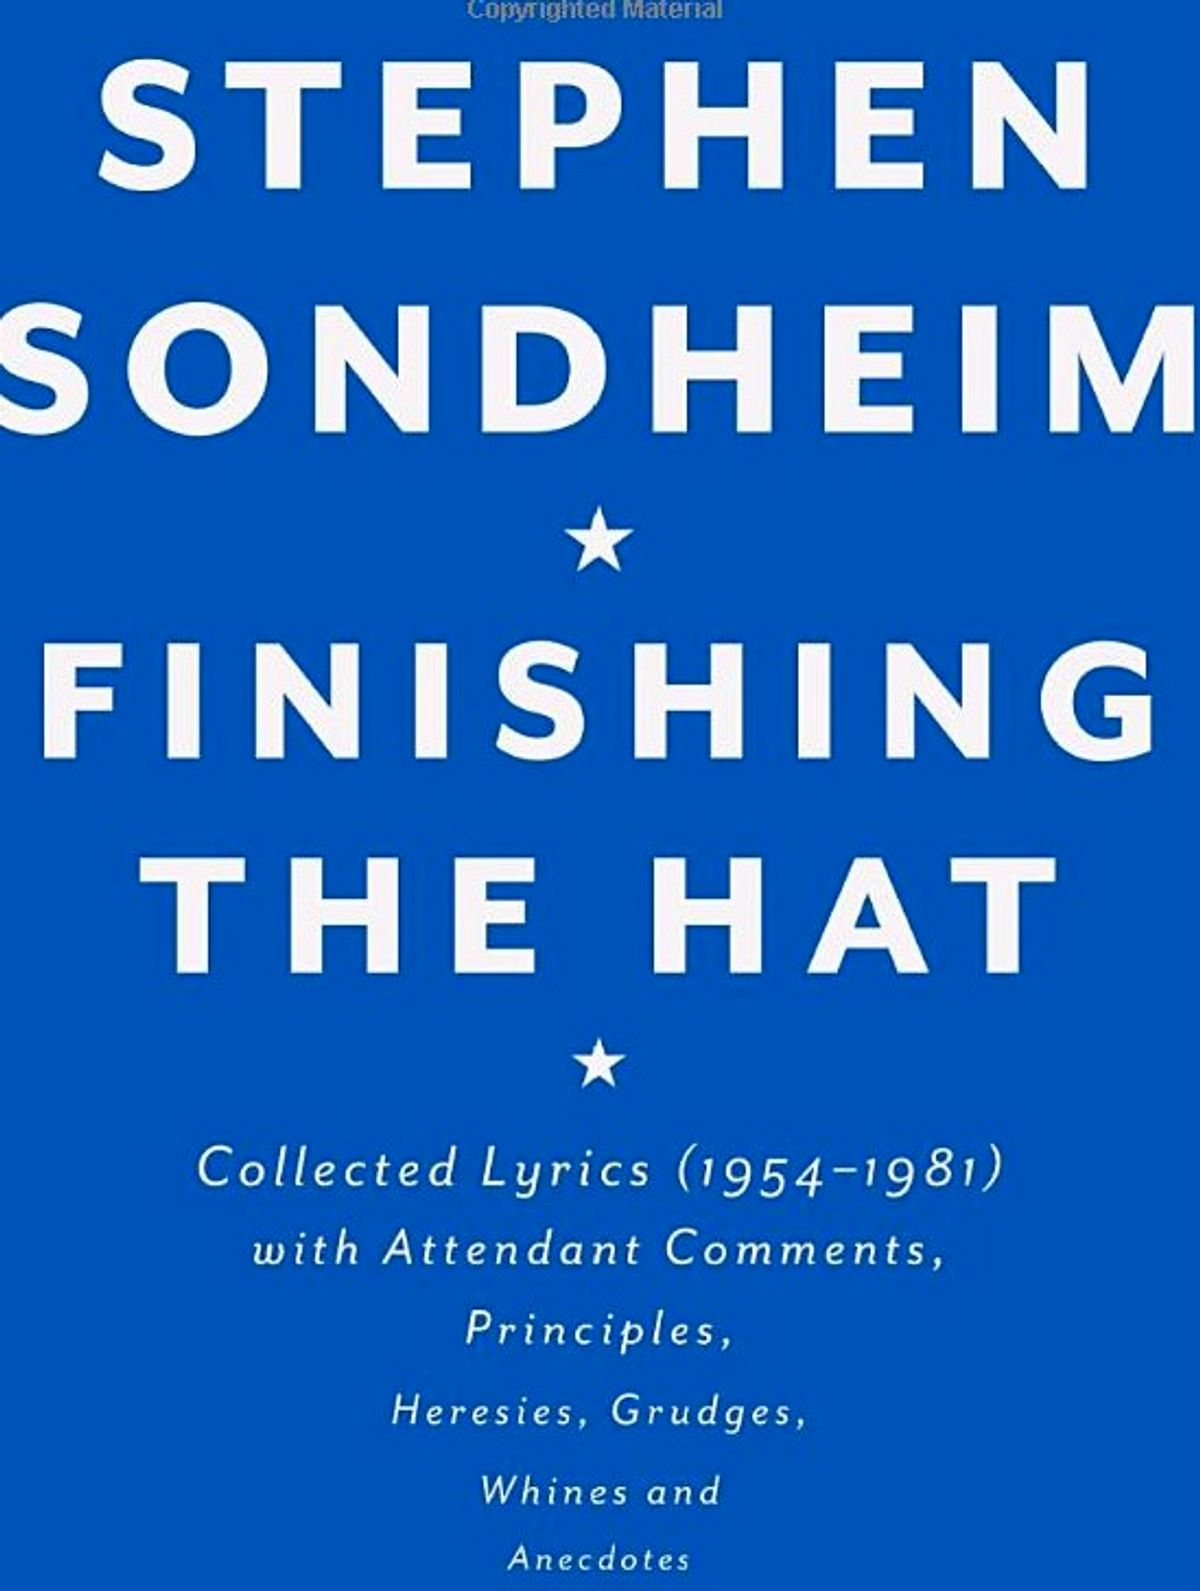 Finishing the Hat by Stephen Sondheim